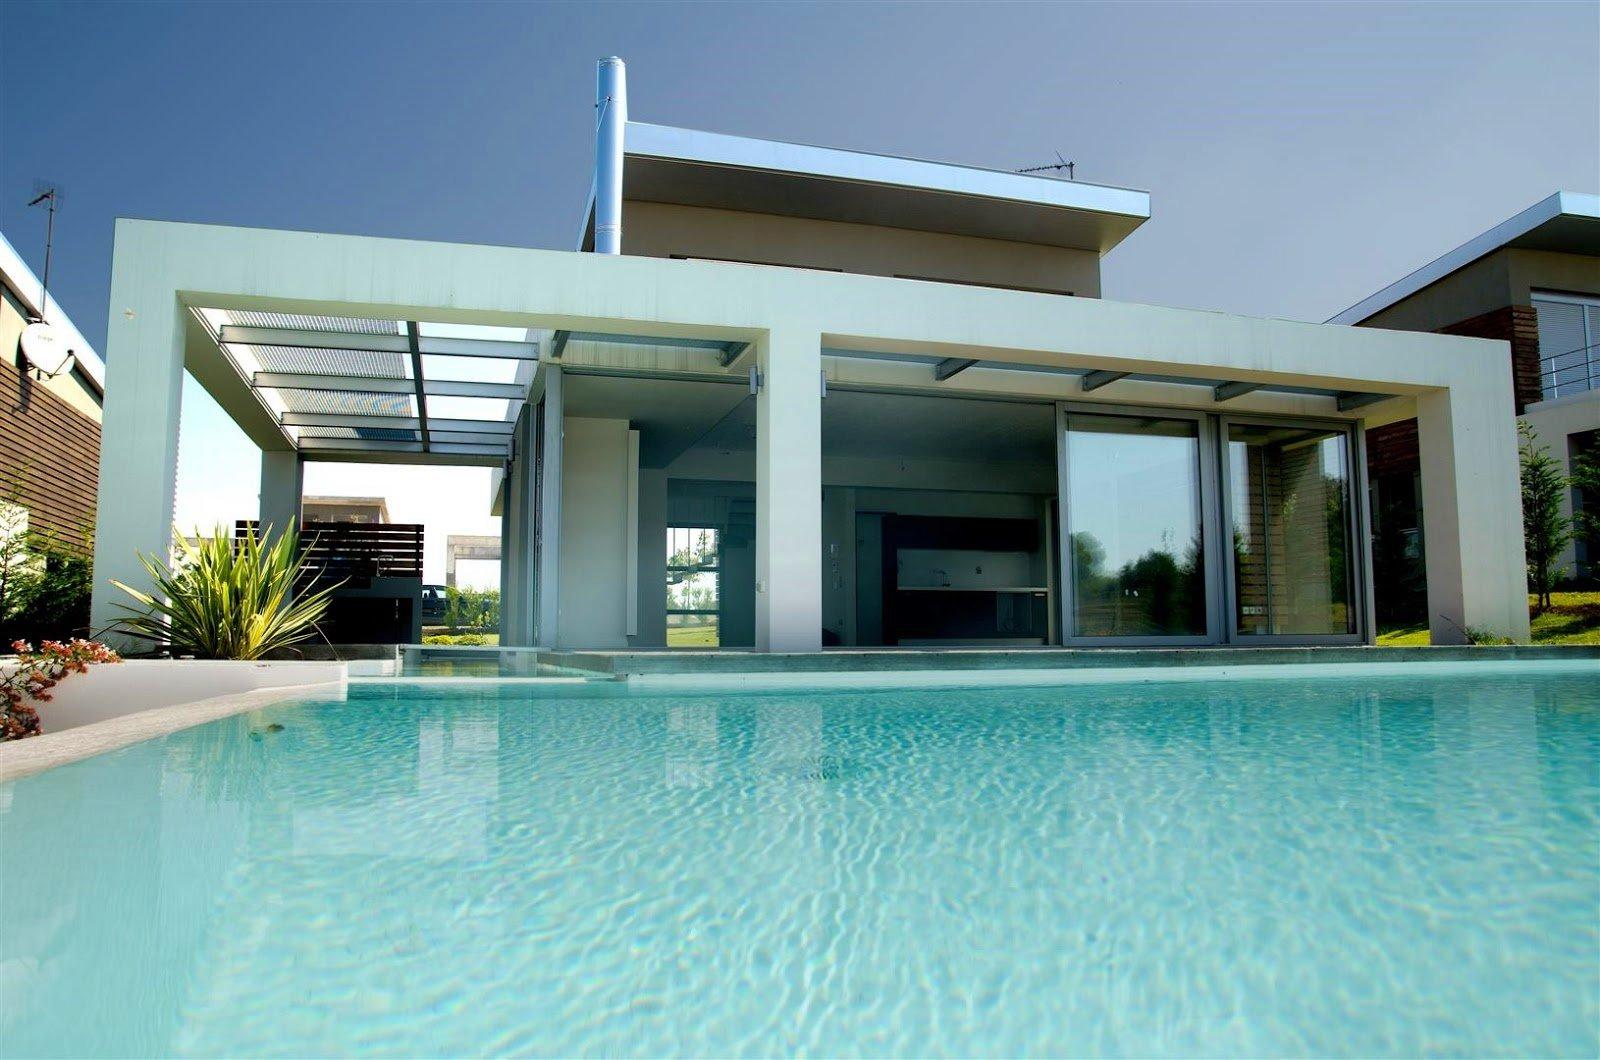 Modern Looking Homes Home Design In Modern Looking Houses